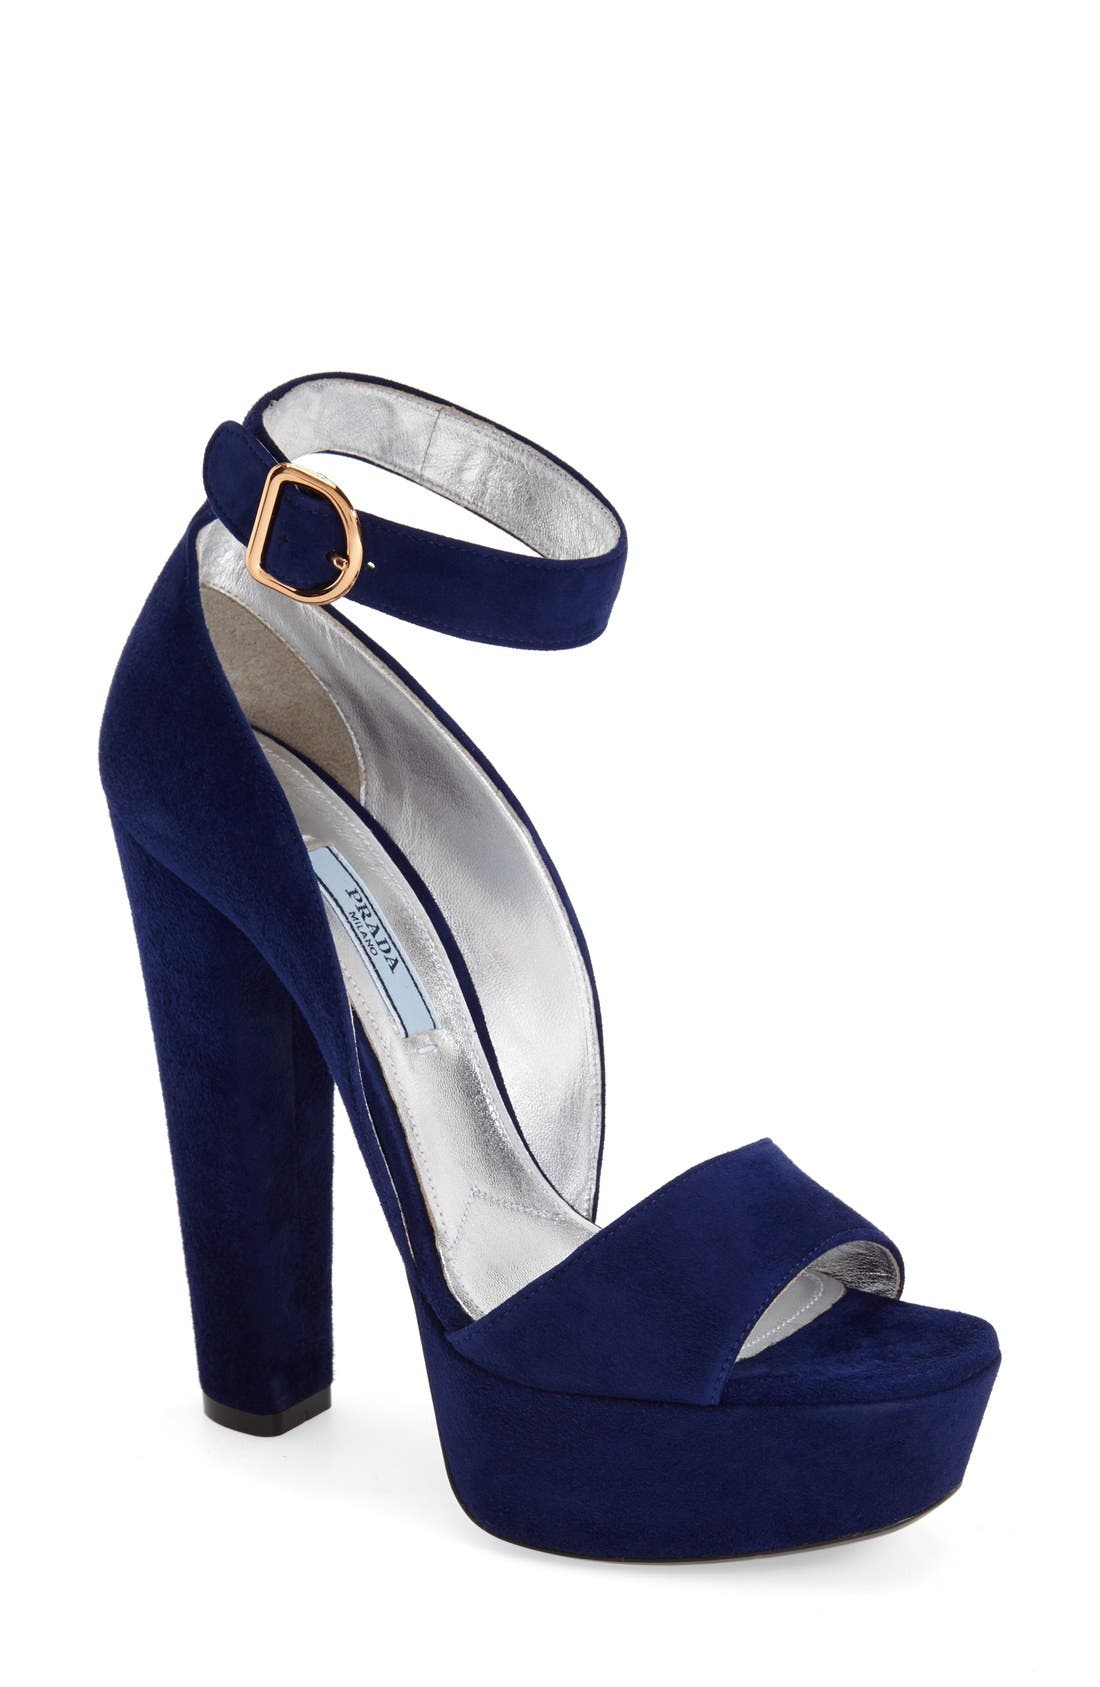 Main Image - Prada Chunky Heel Sandal (Women)